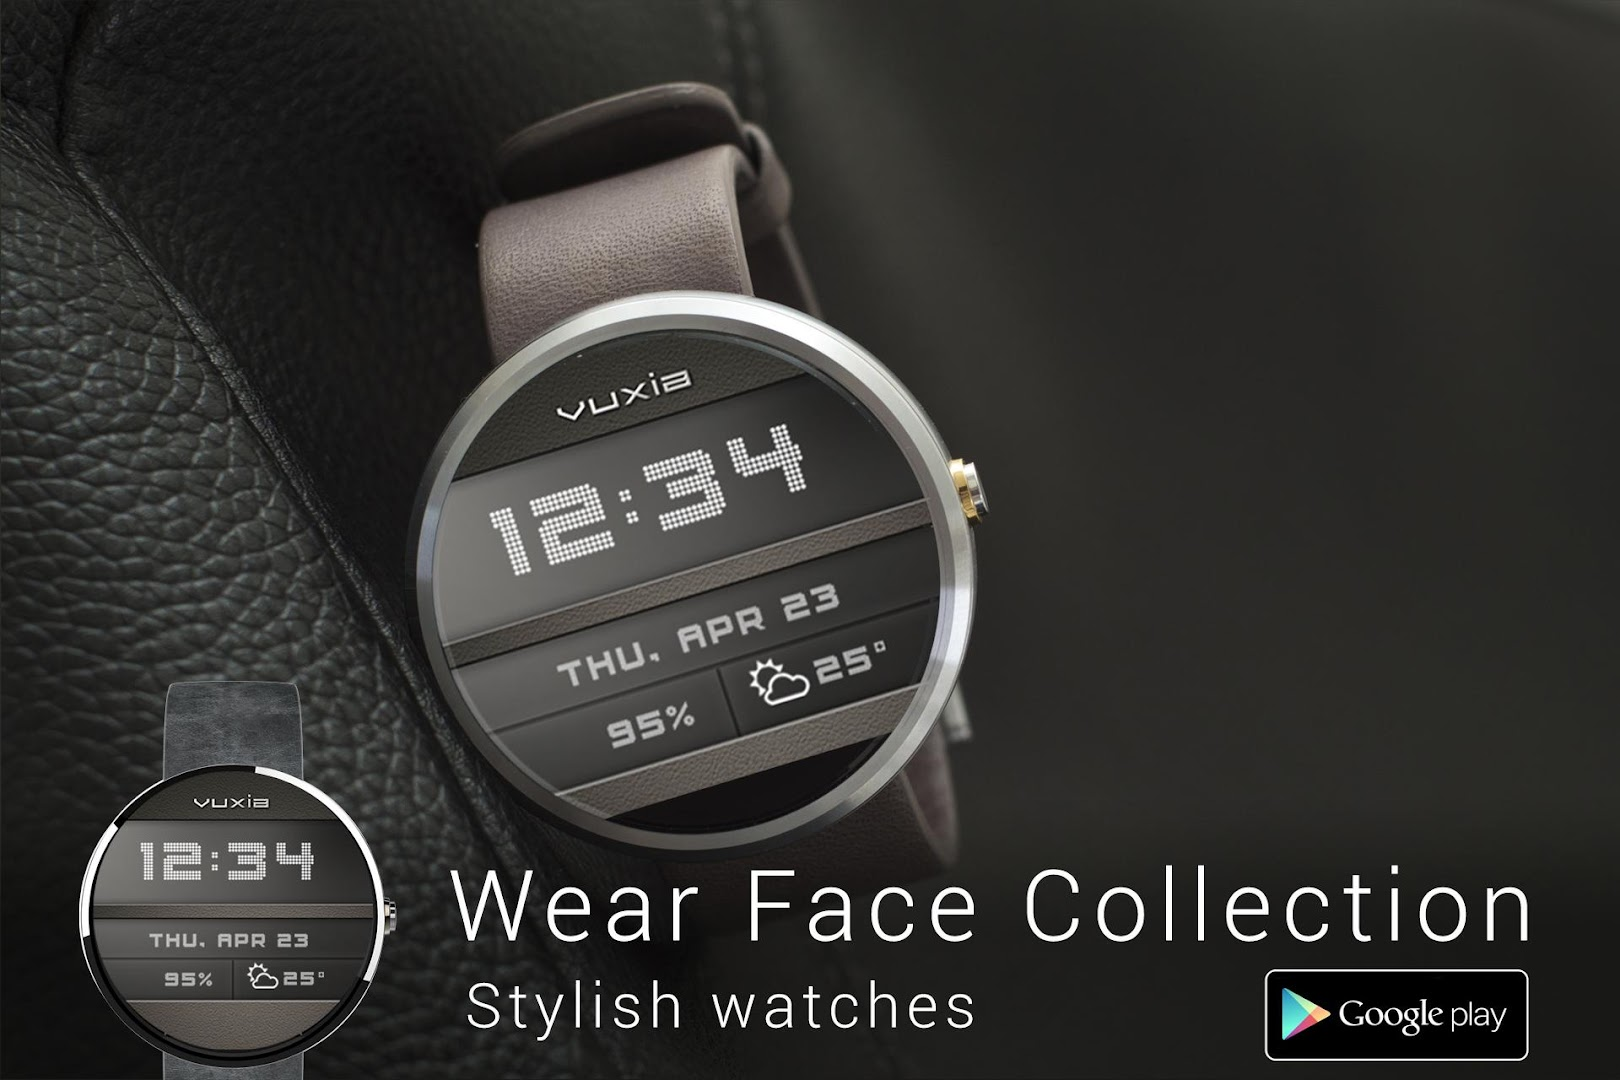 Wear face collection - Wear Face Collection Google Play Store Revenue Download Estimates Australia